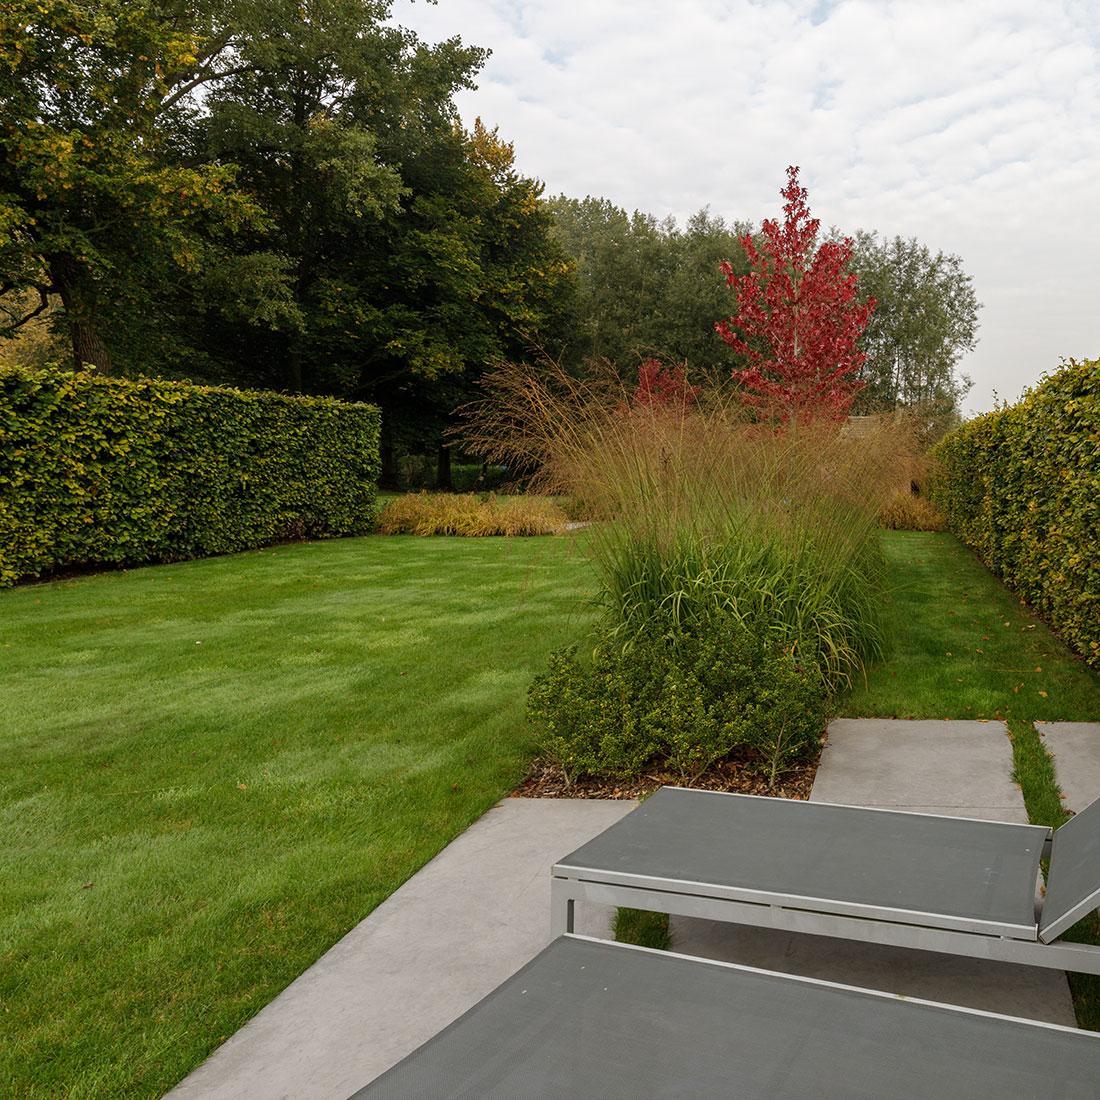 Polybeton-natuurlijk-tuin-tuinontwerp-156-49.jpg